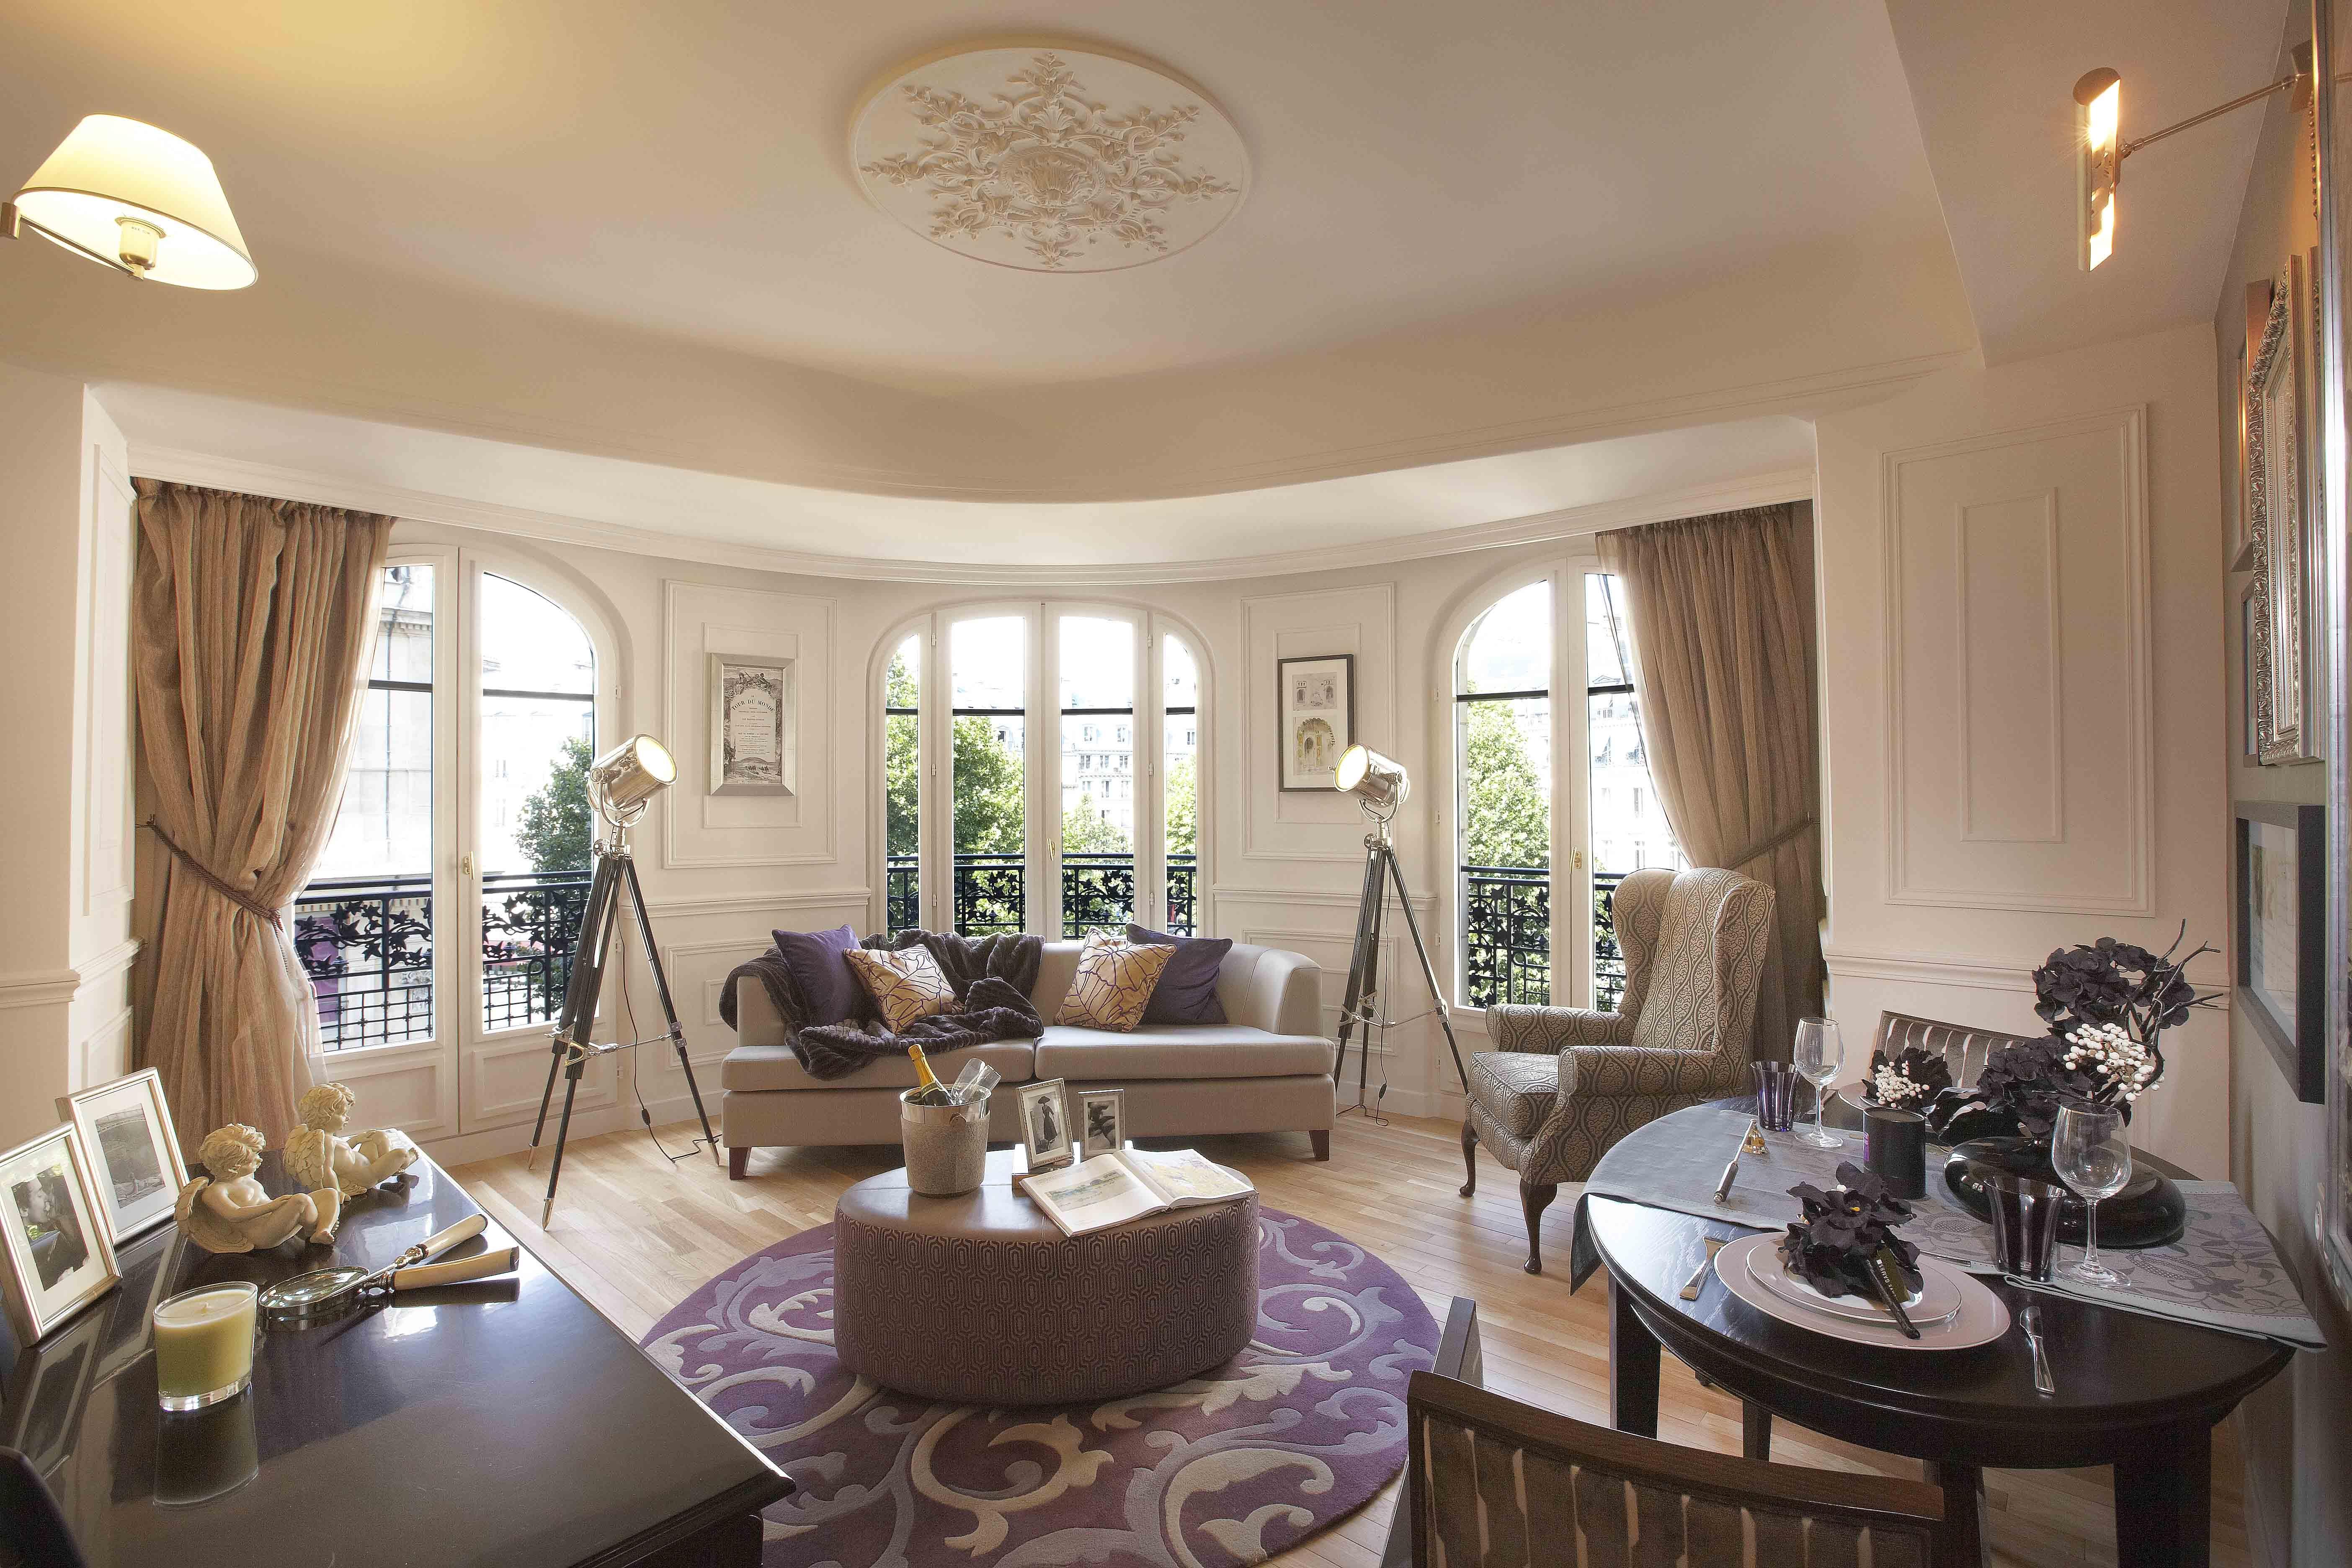 ascott launches citadines suites new serviced apartments